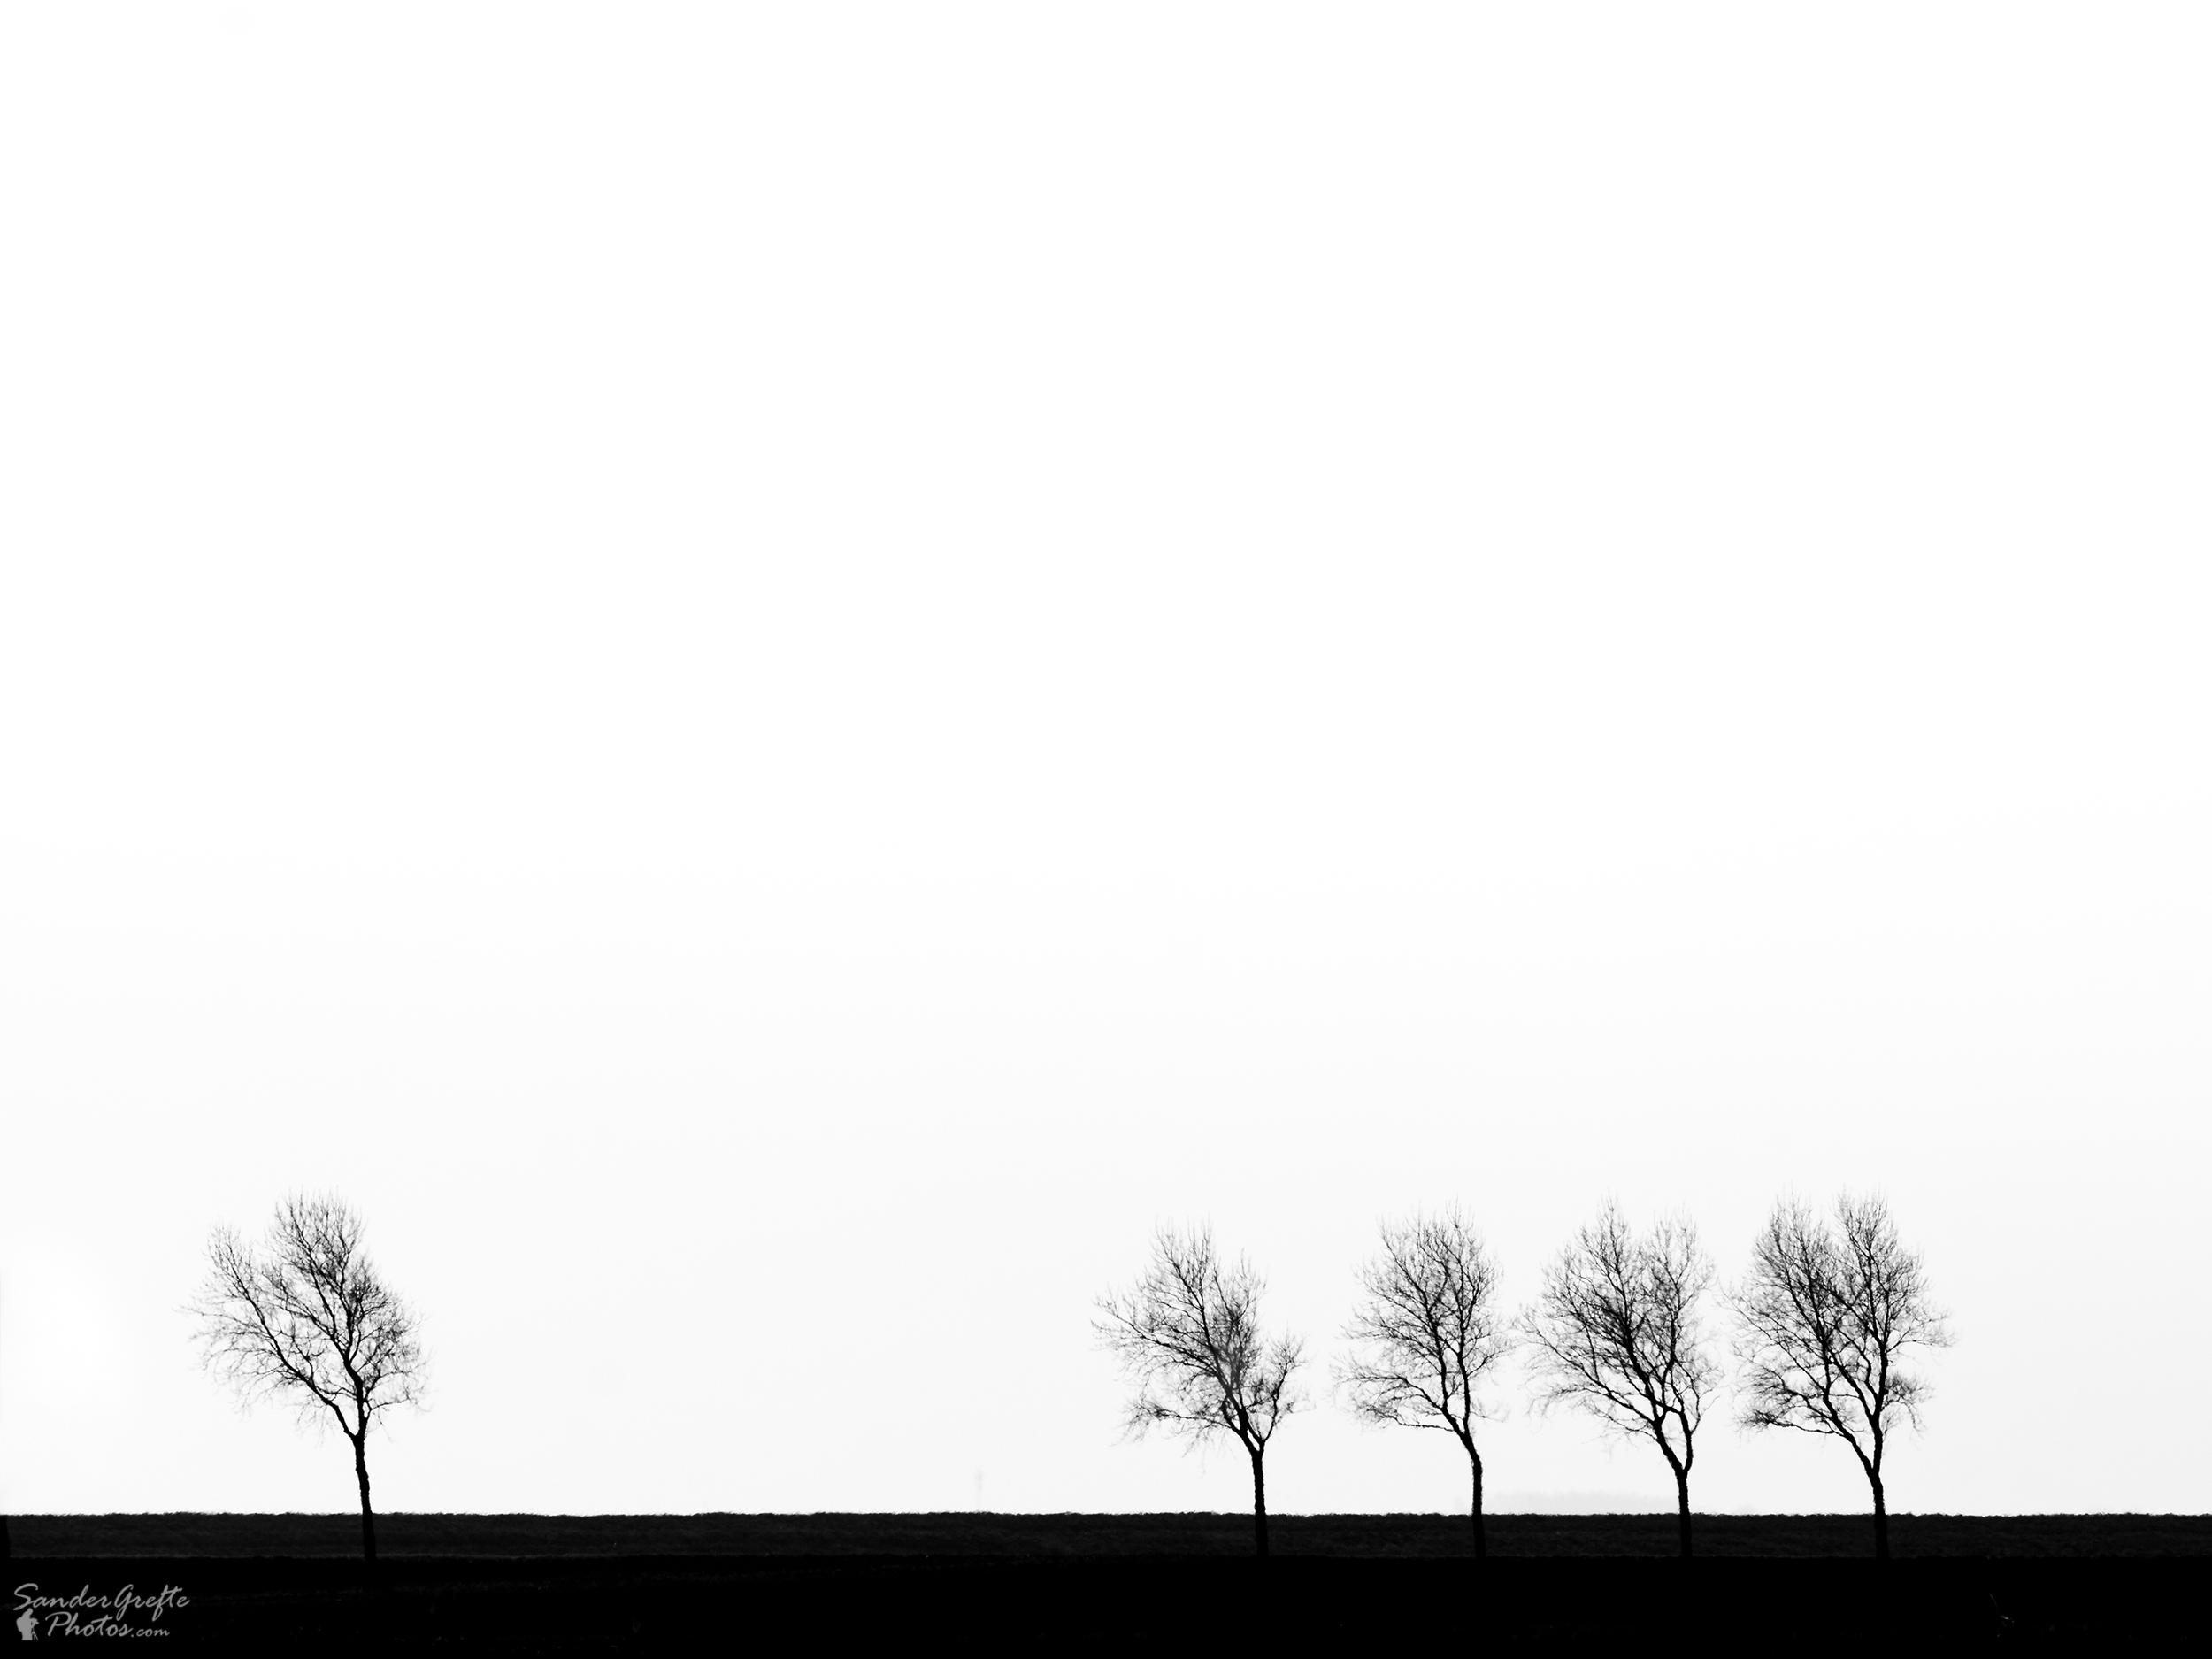 Bomen: 300mm, iso 100, f9, 1/640s